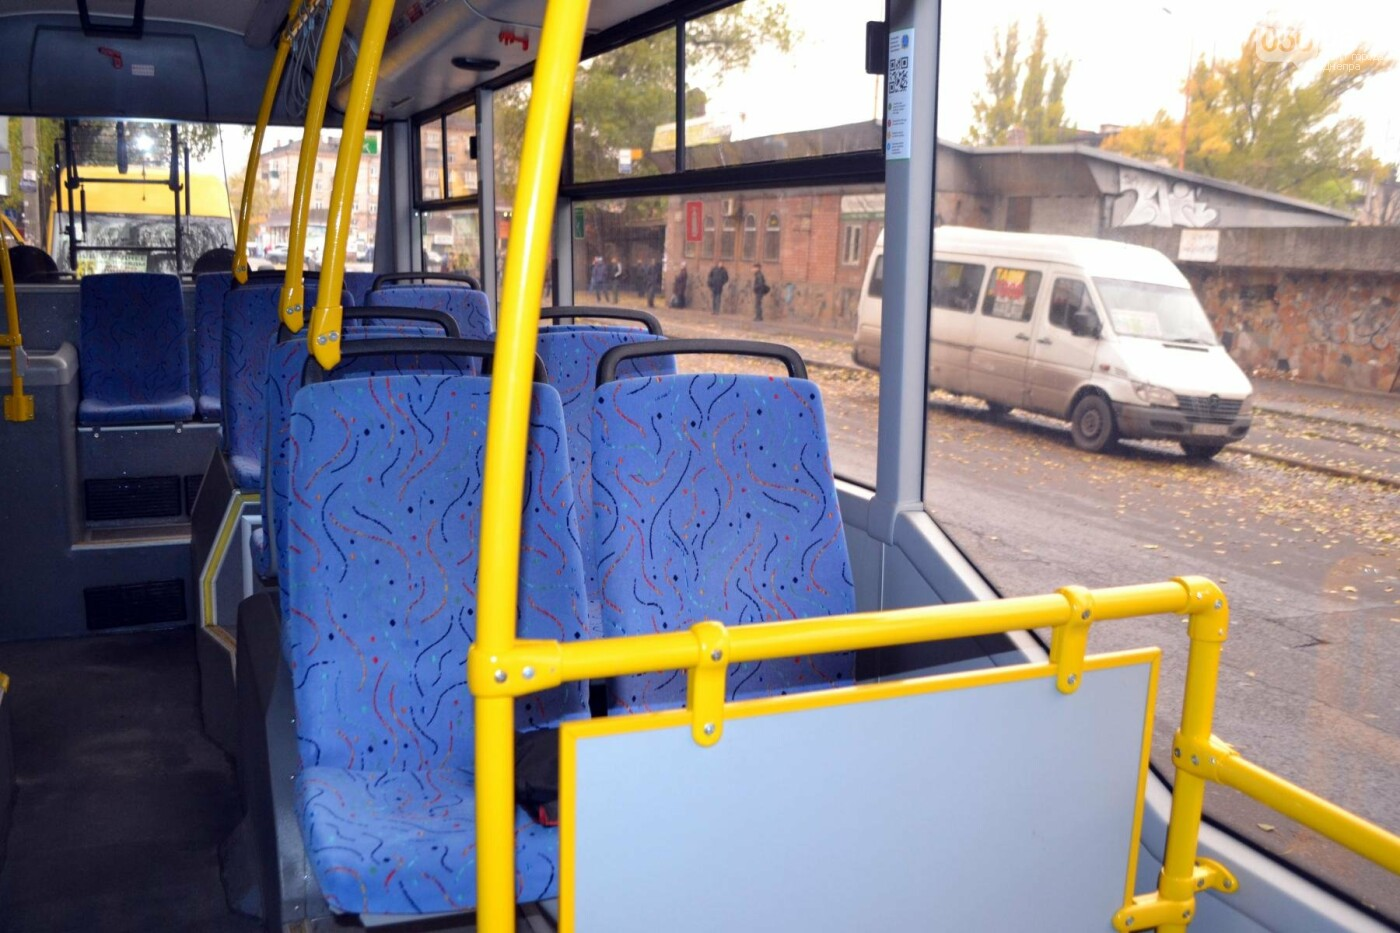 Как журналистка 056.ua на троллейбусе в Подгородное каталась (ФОТОРЕПОРТАЖ), фото-1